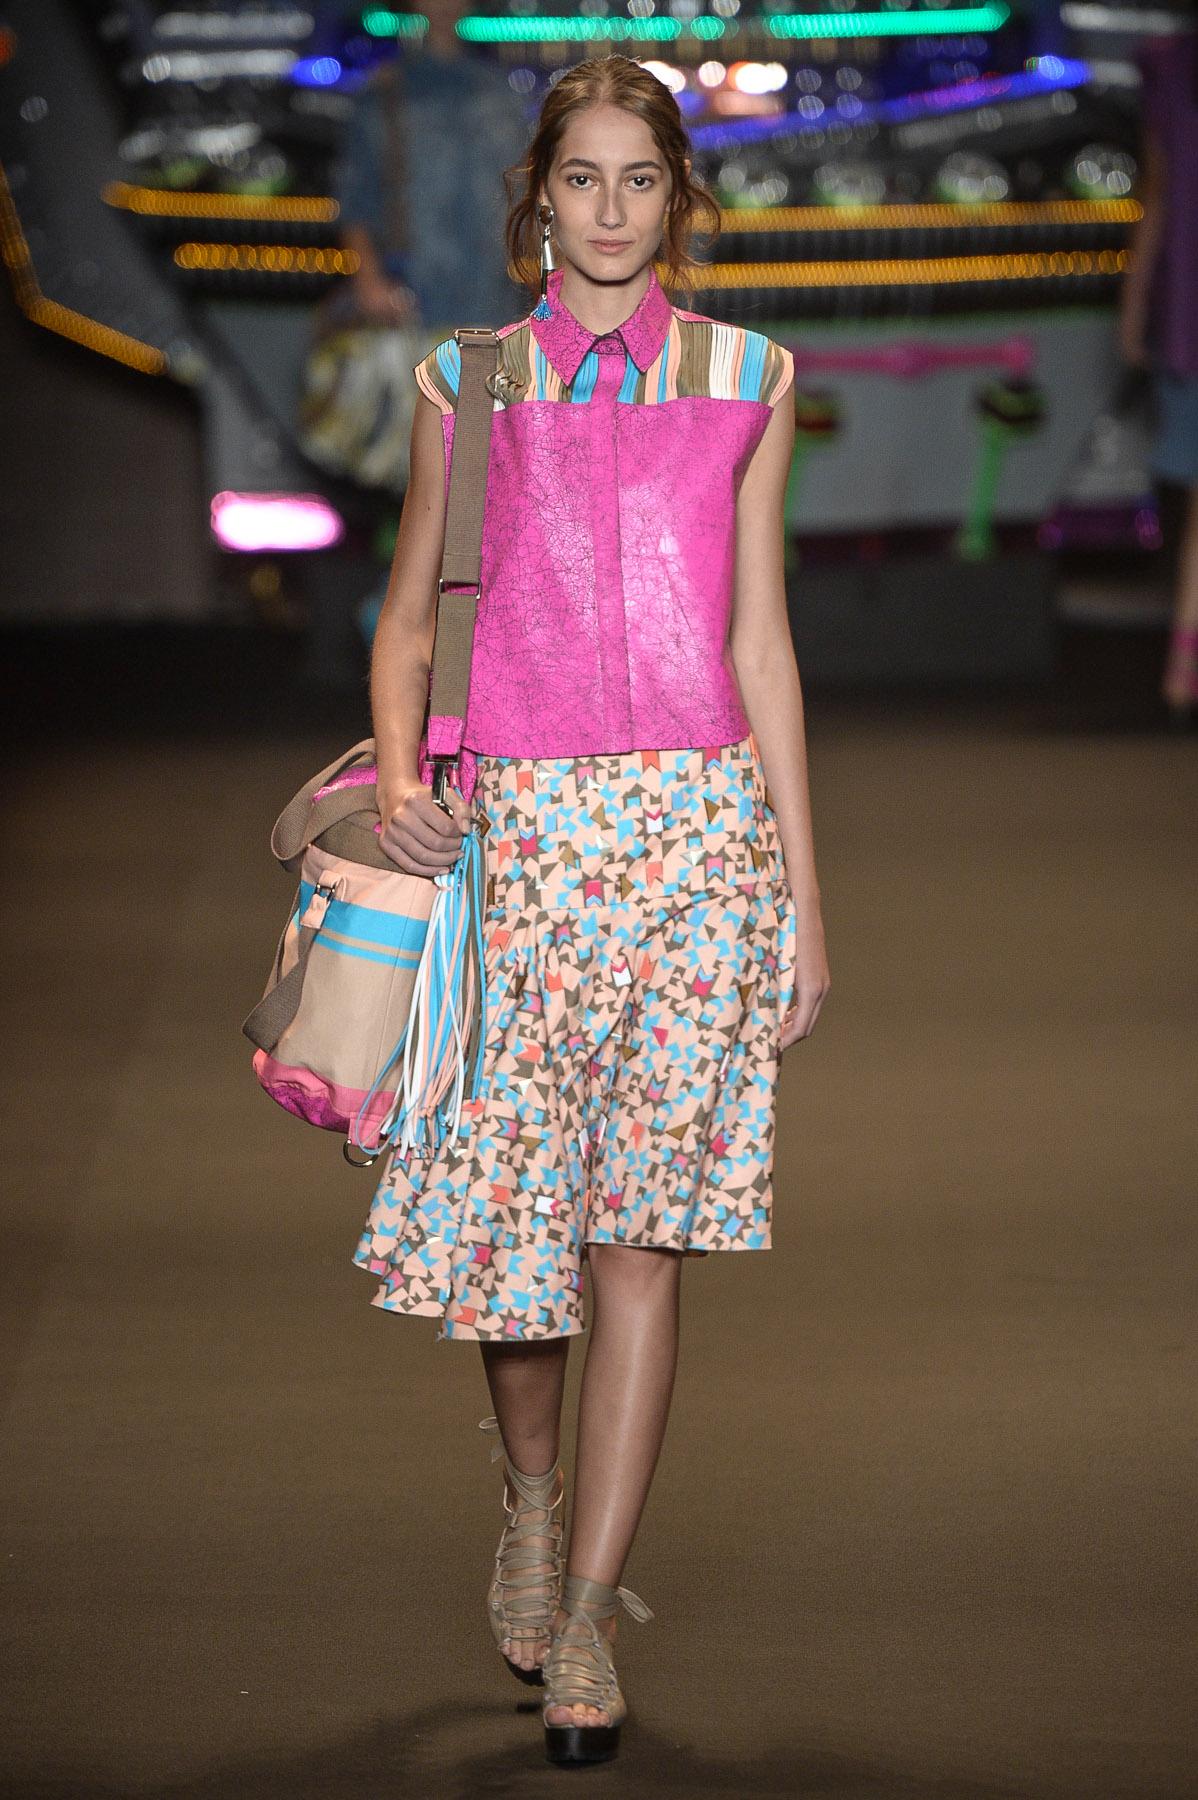 Cole O Espa O Fashion Fashion Rio Ver O 2015 Rtw Desfiles Ffw